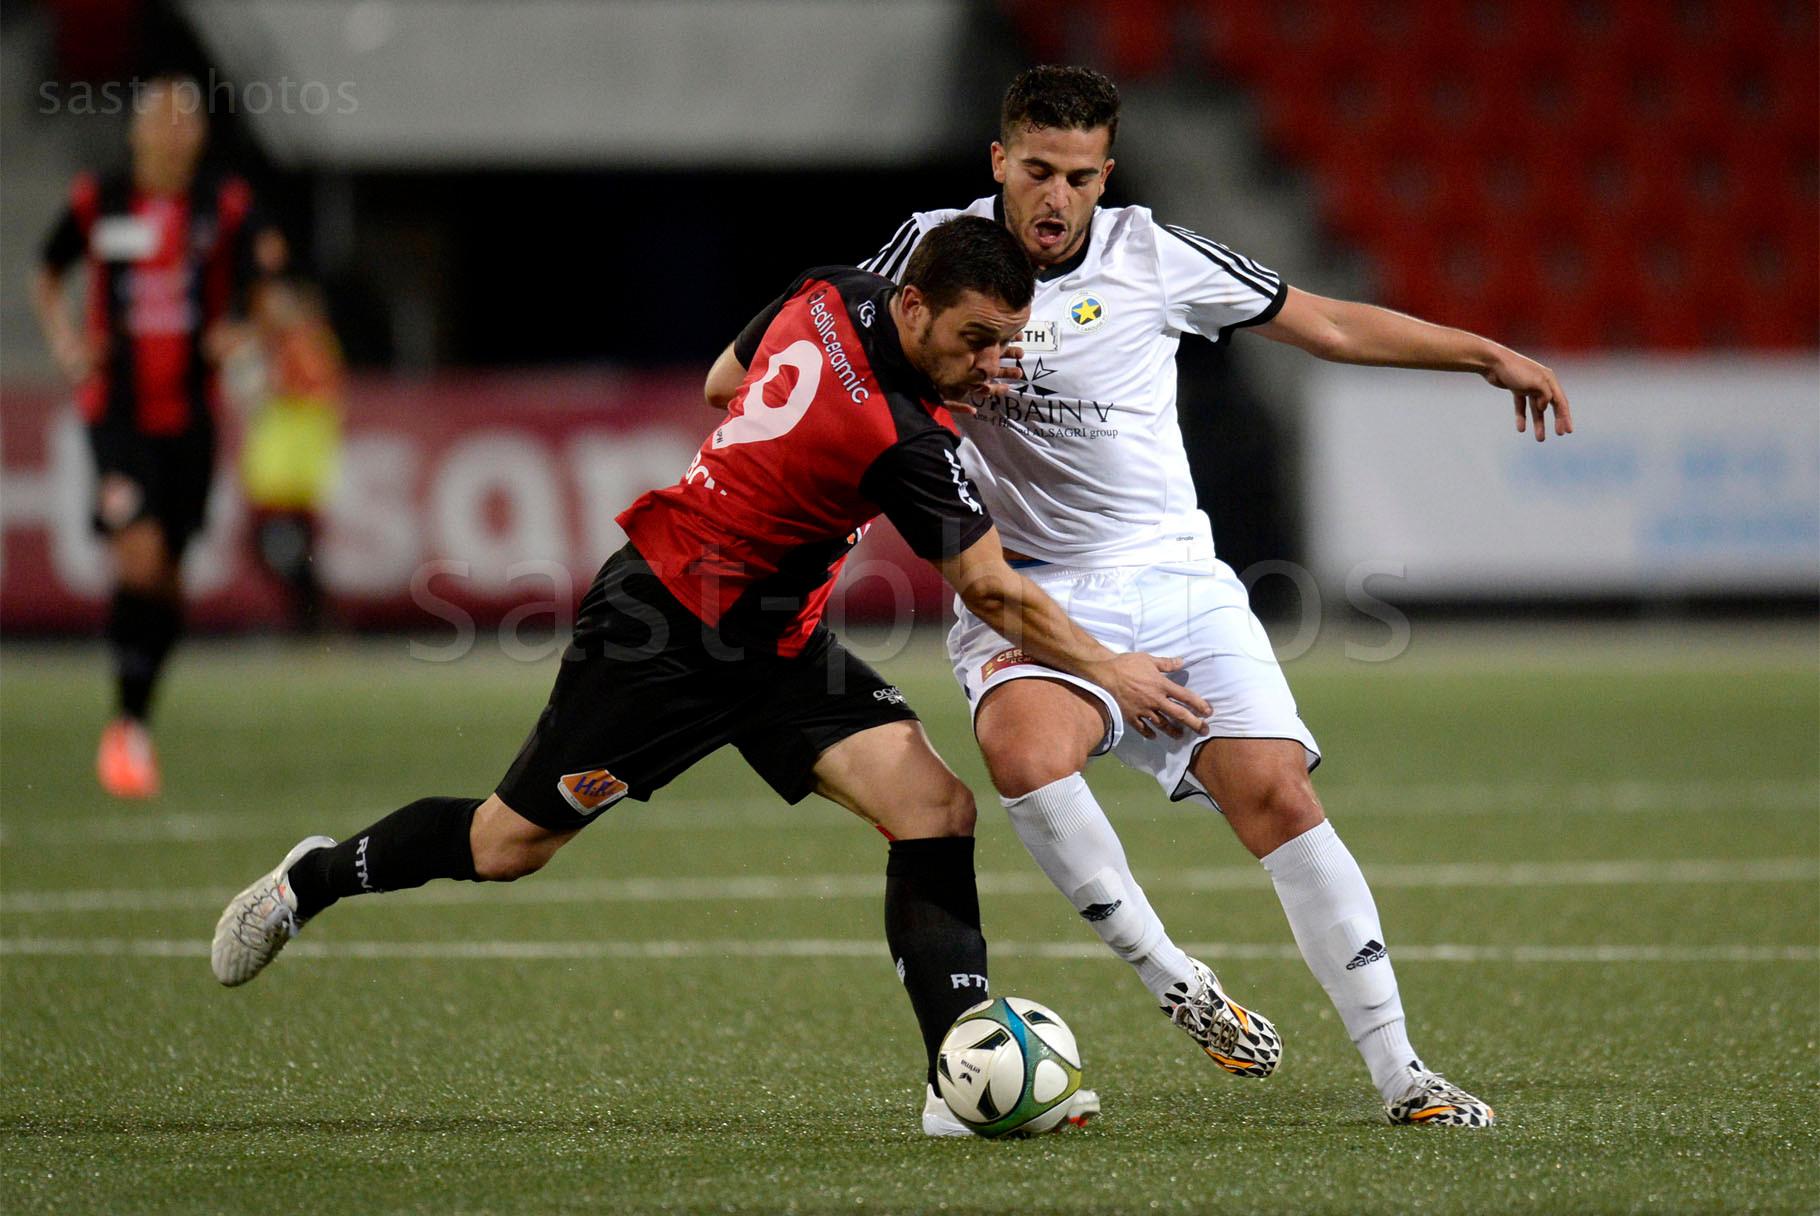 Mickael Rodriguez (L. Xamax FCS) gegen Hicham Bouamri (Carouge)